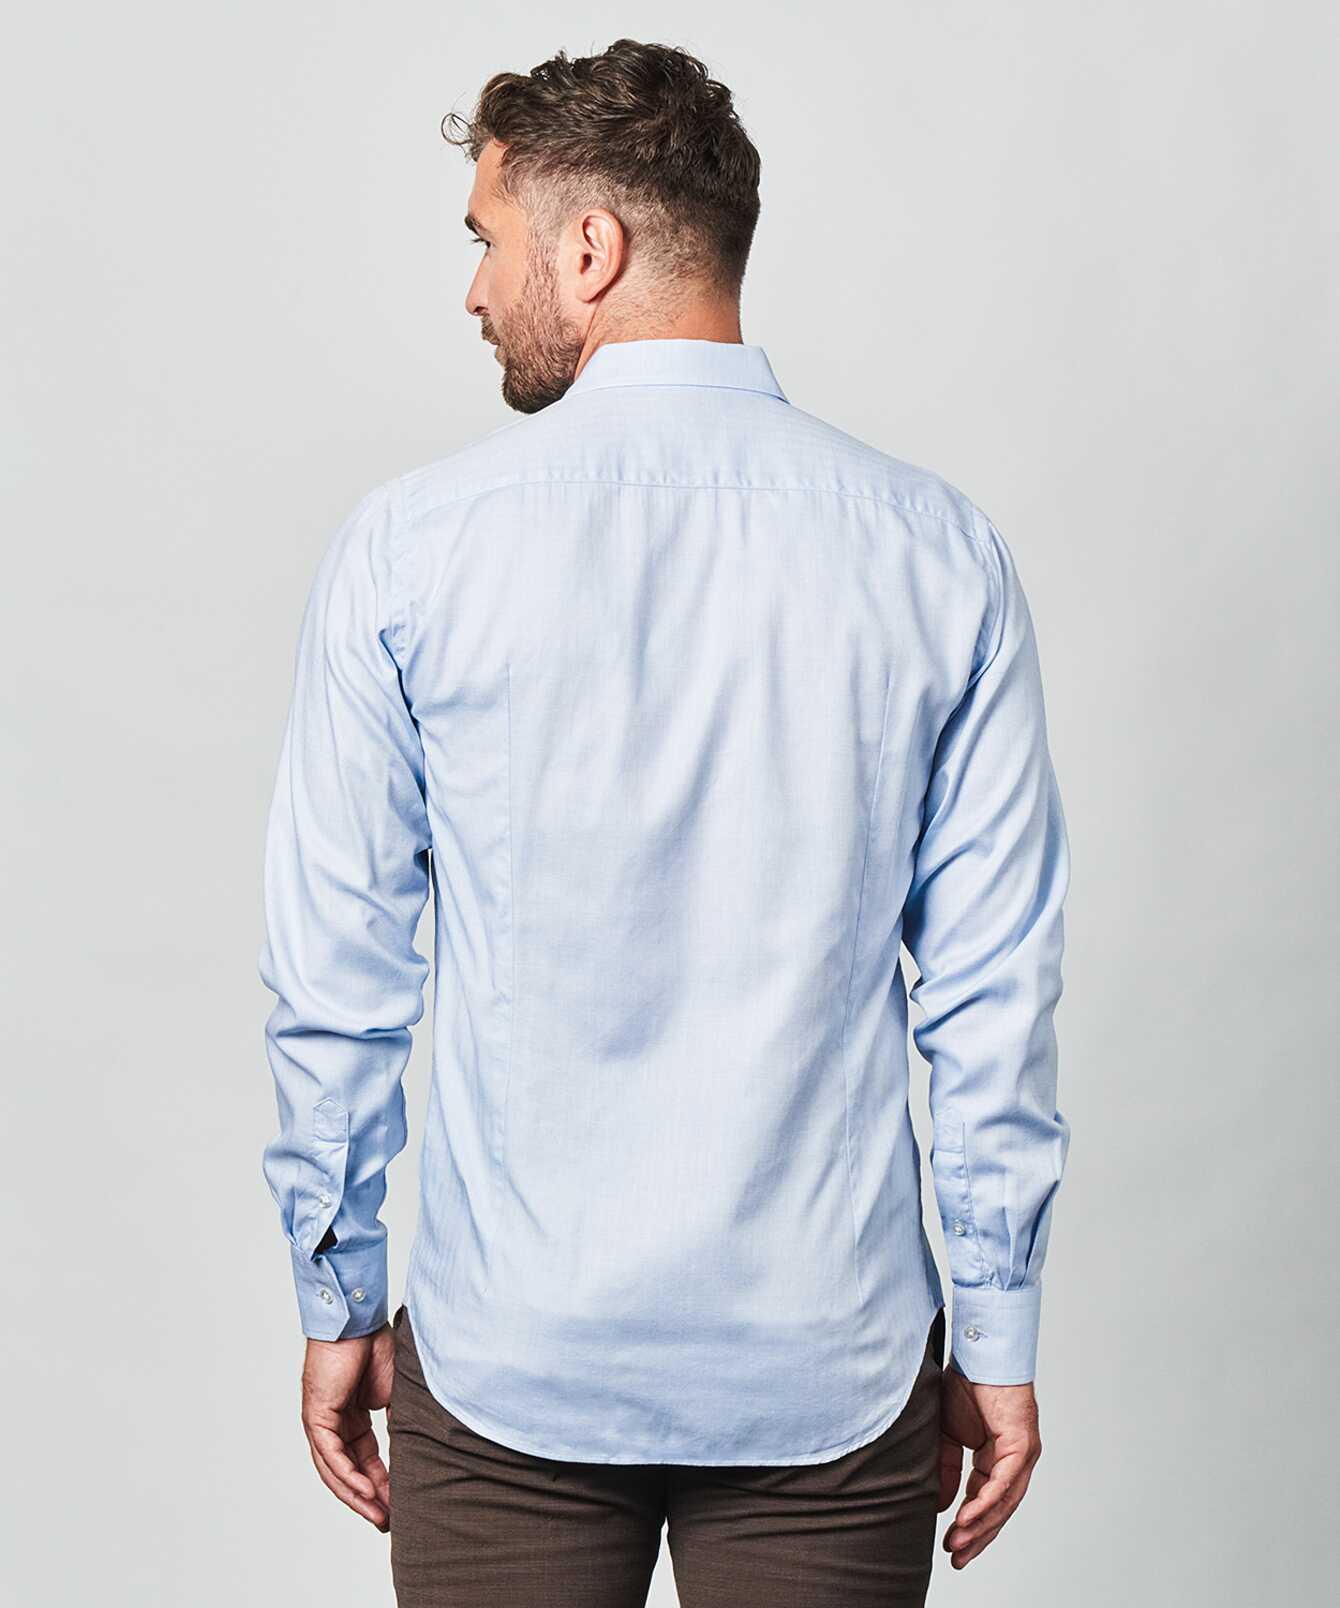 Shirt Lewiston Blue Extra Long Sleeve The Shirt Factory